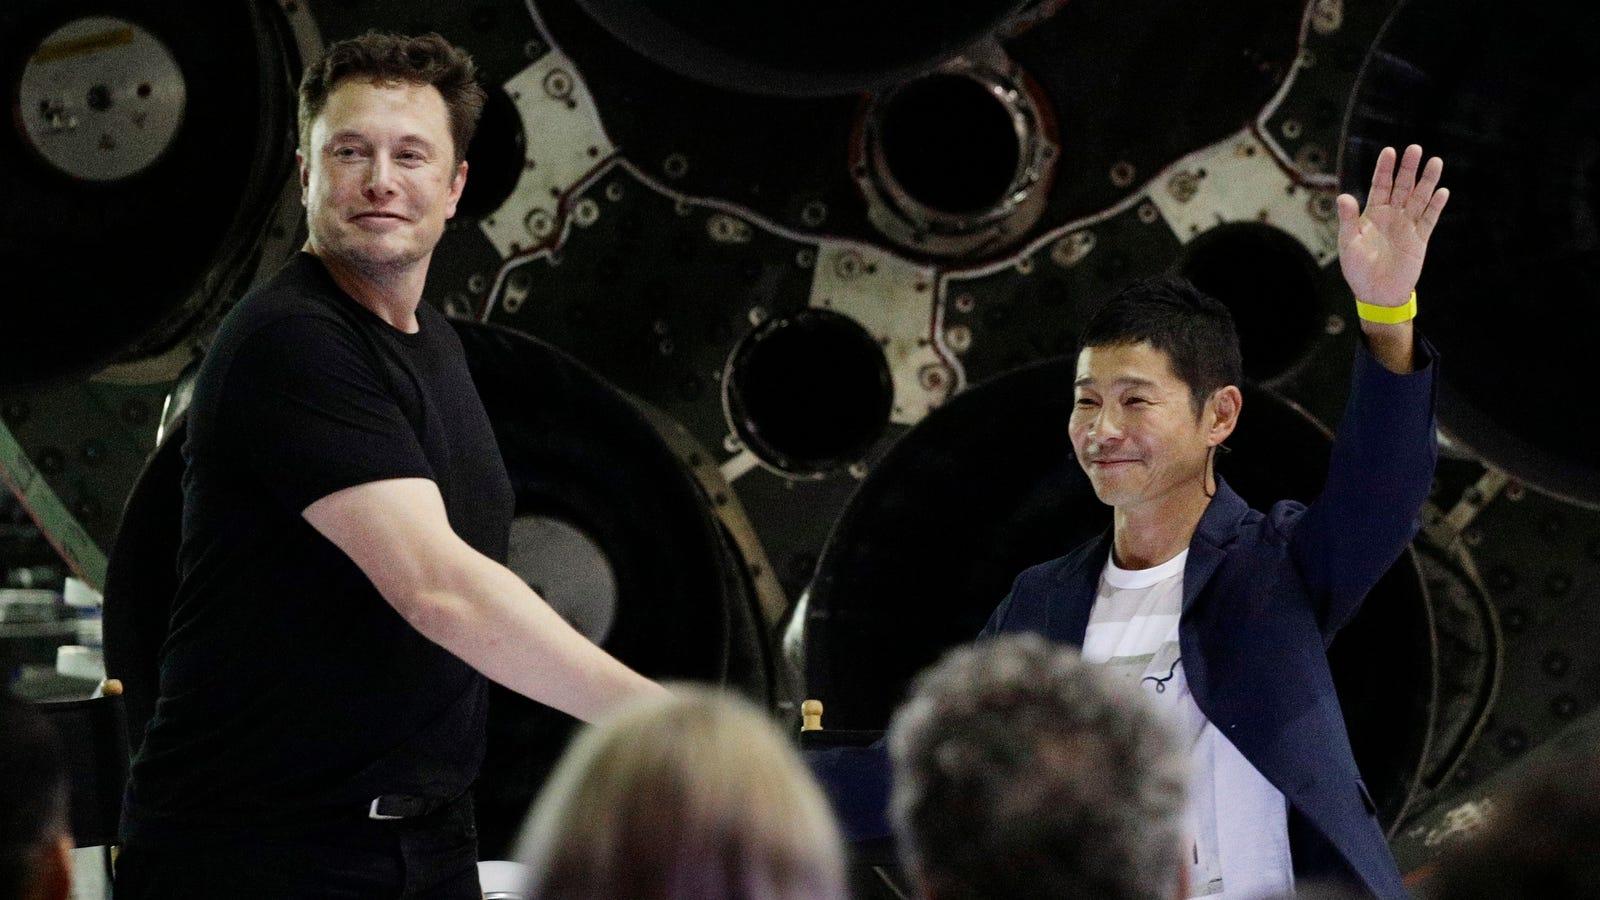 Elon Musk Names Japanese Billionaire Yusaku Maezawa as First Tourist on SpaceX's BFR